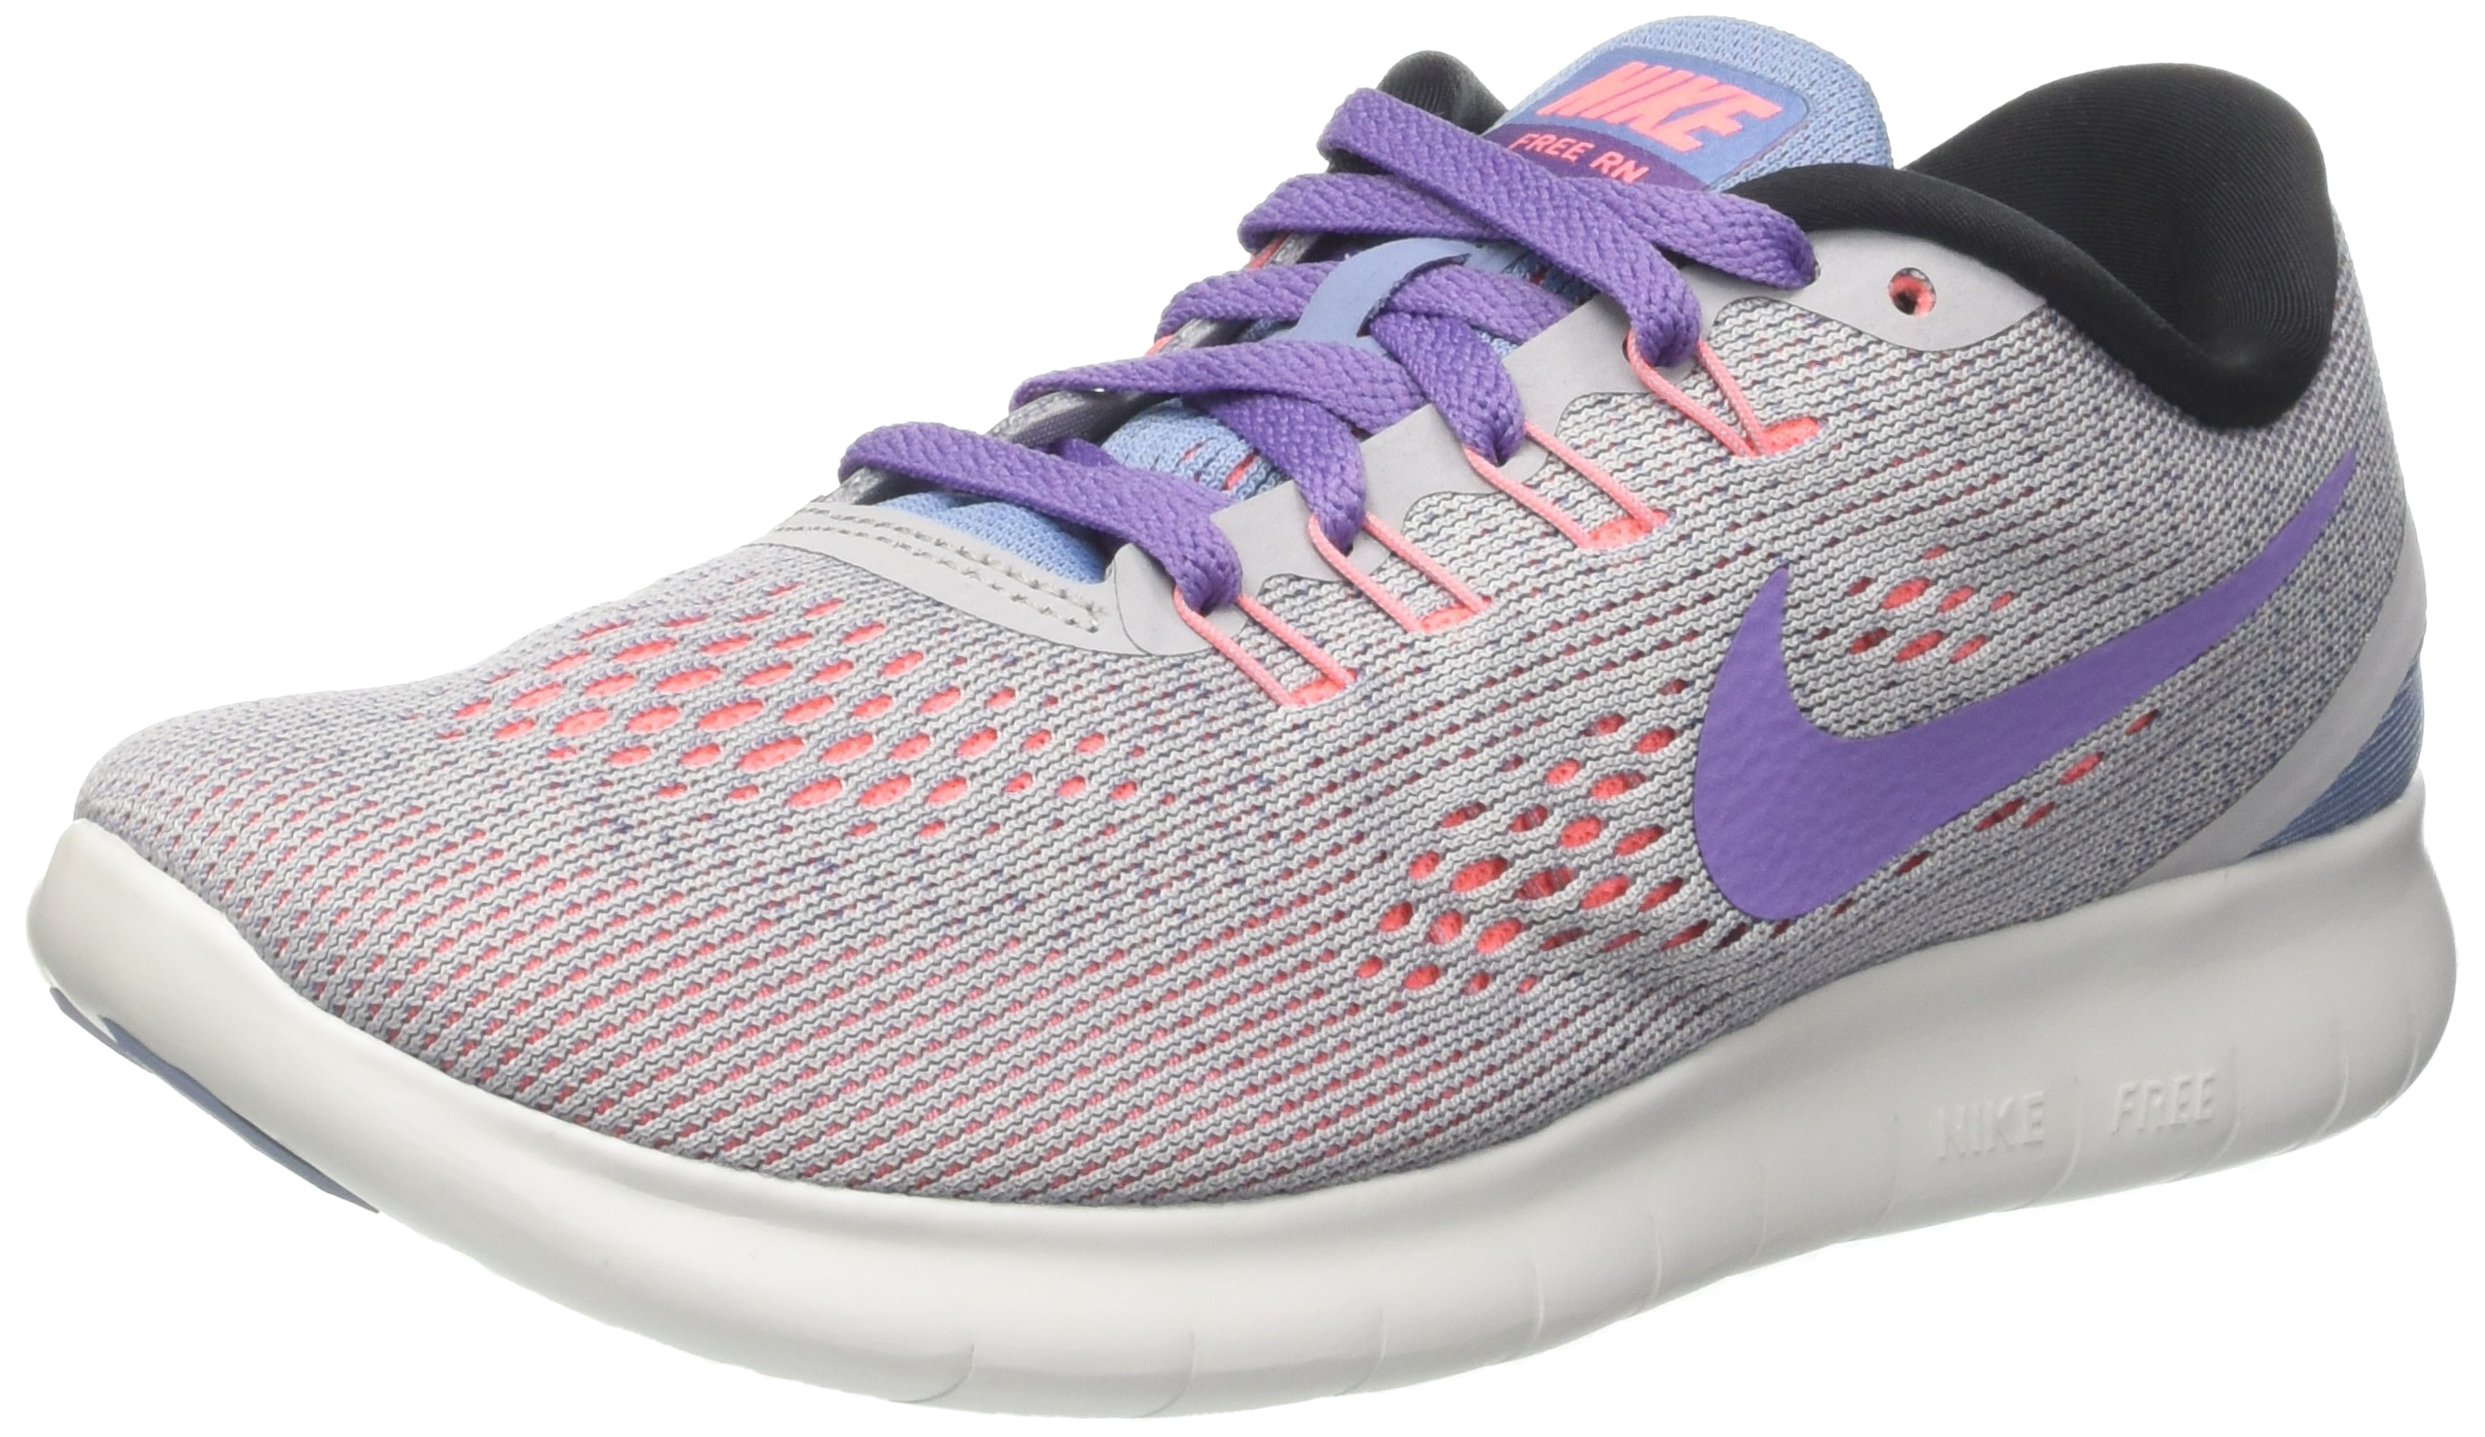 9c7fdb102d42 Galleon - NIKE Women s Free Rn Distance Running Shoe (5.5 B US